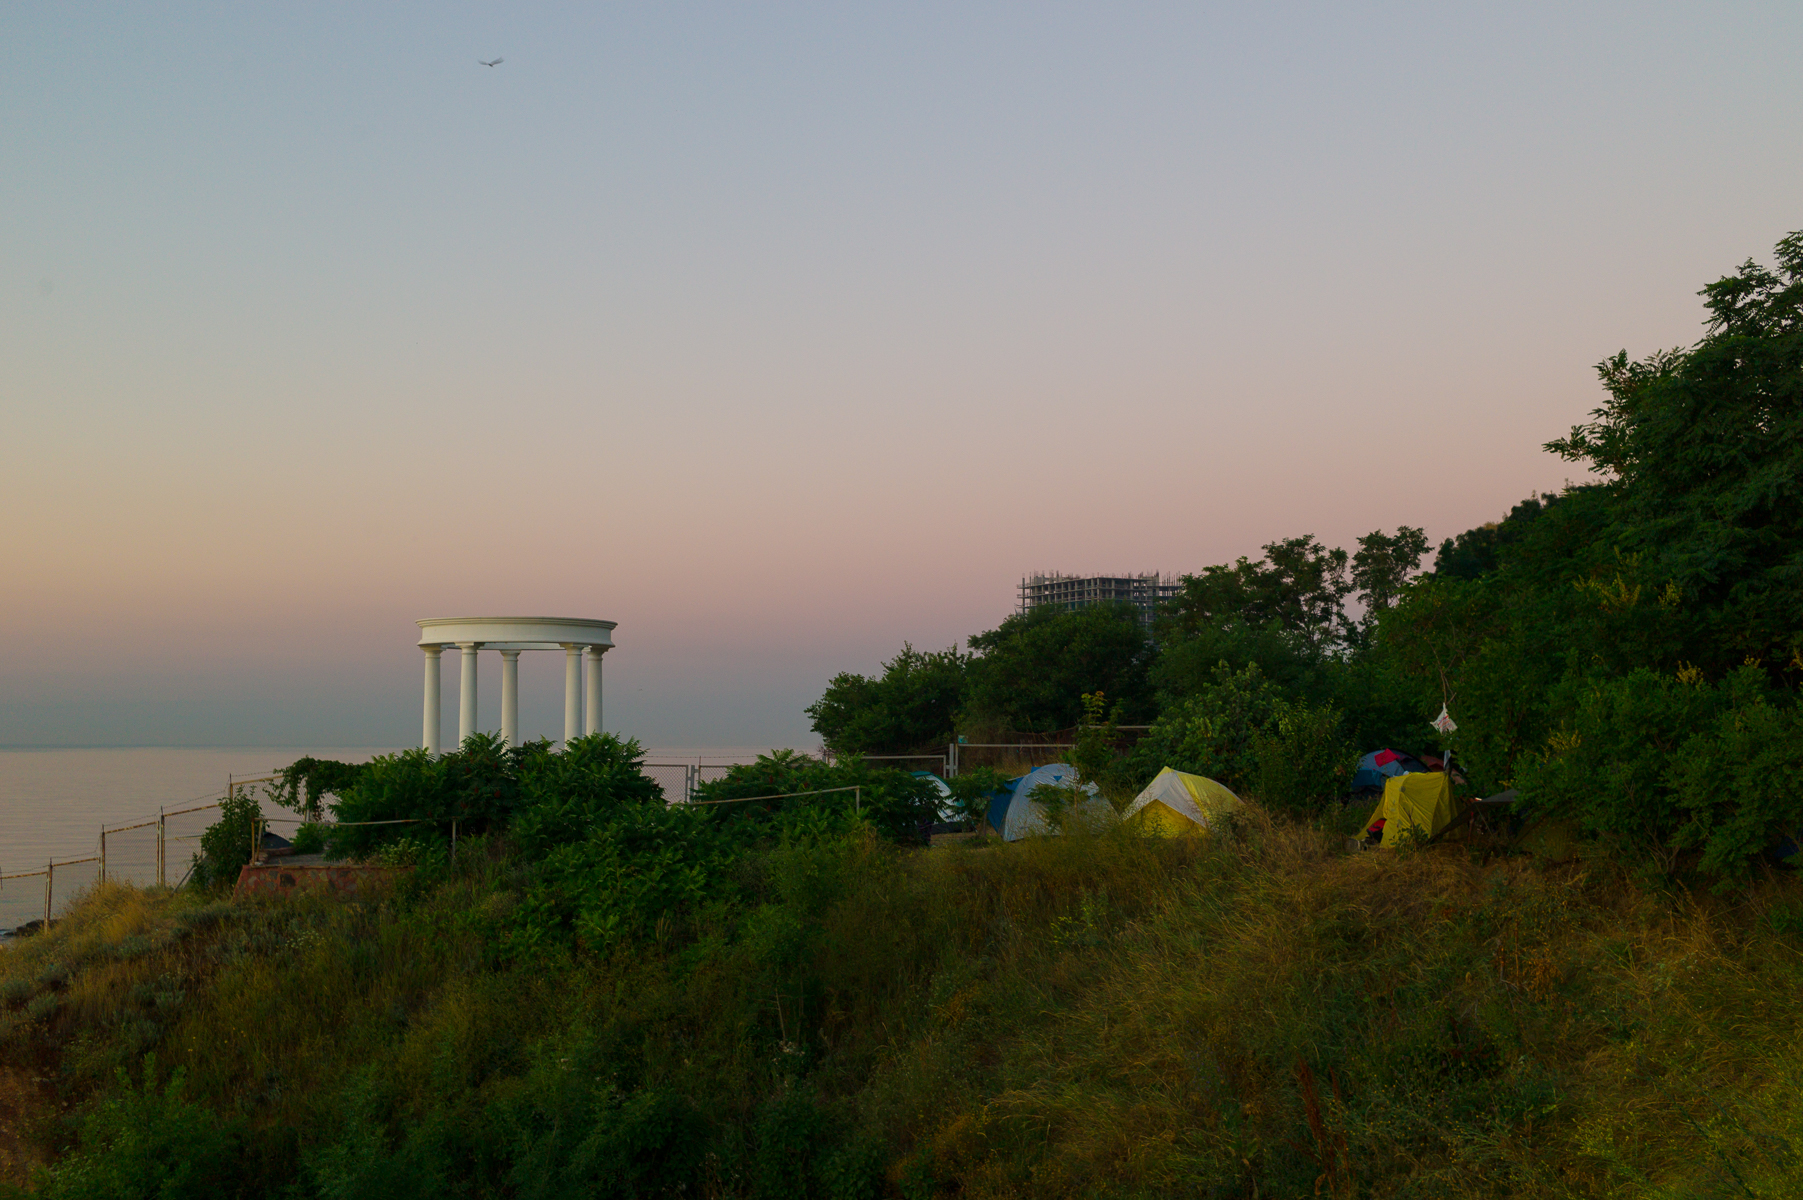 Campsite in Odessa. June 14